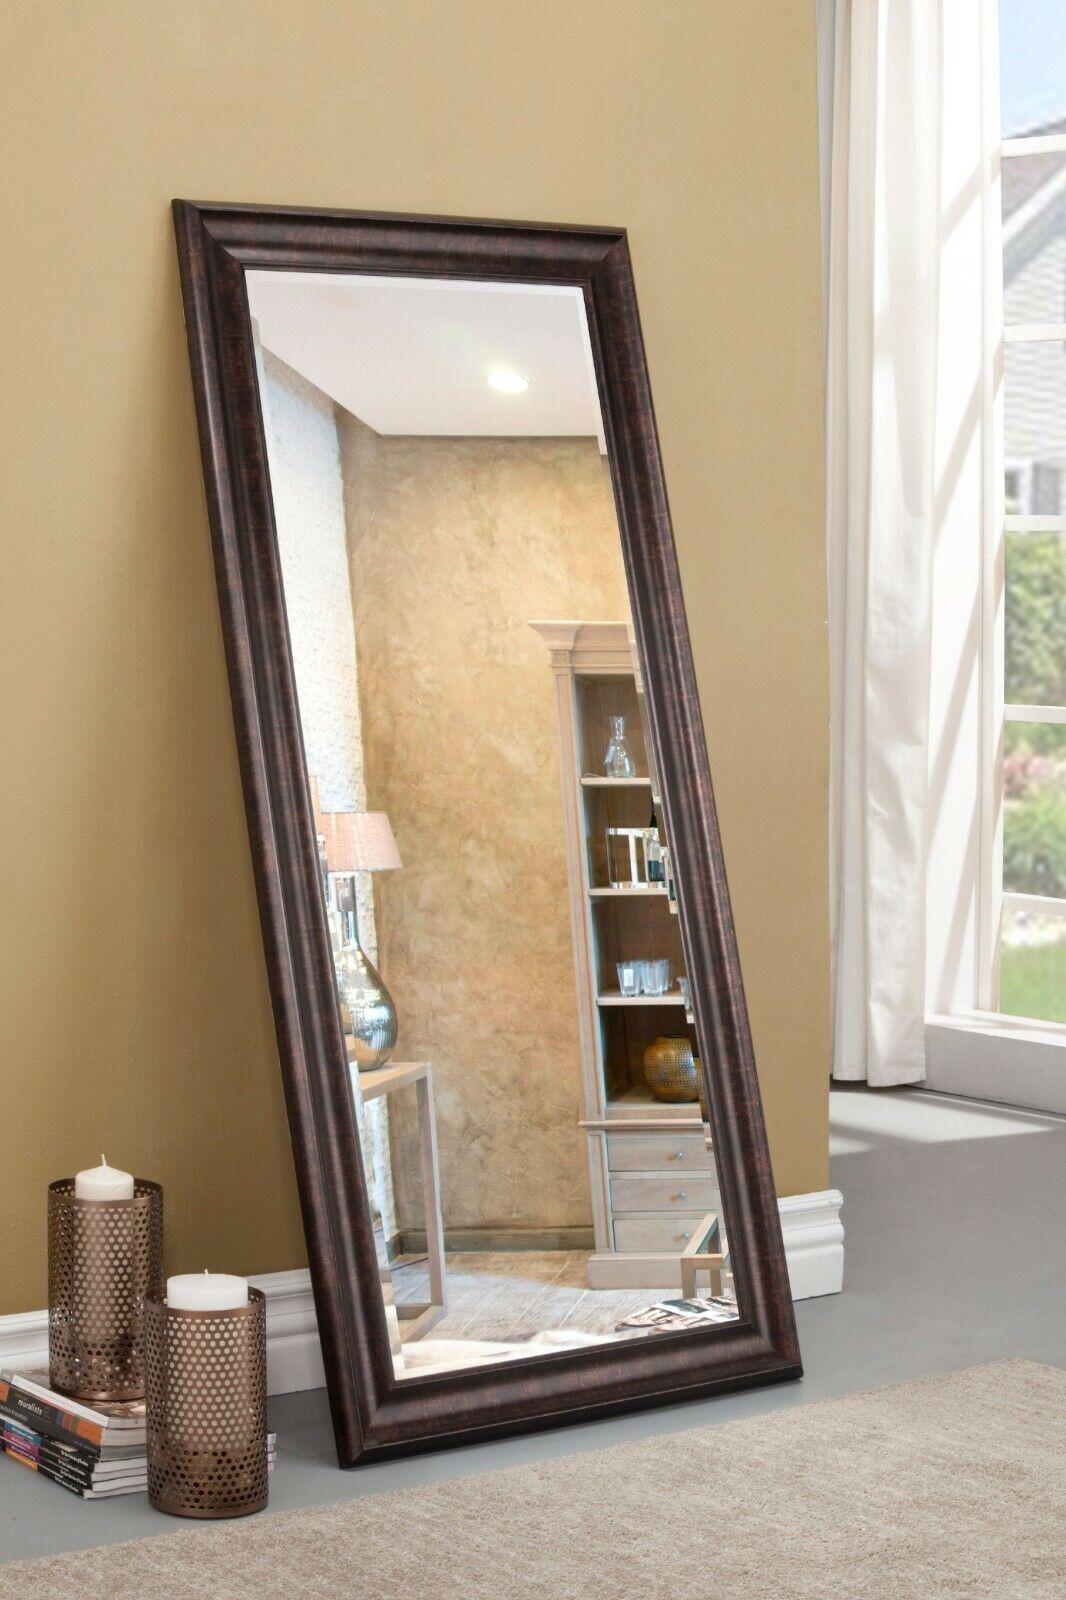 Large Sunburst Wall Mirror Decorative Antiqued Gold Round Sun Burst Living Room For Sale Online Ebay